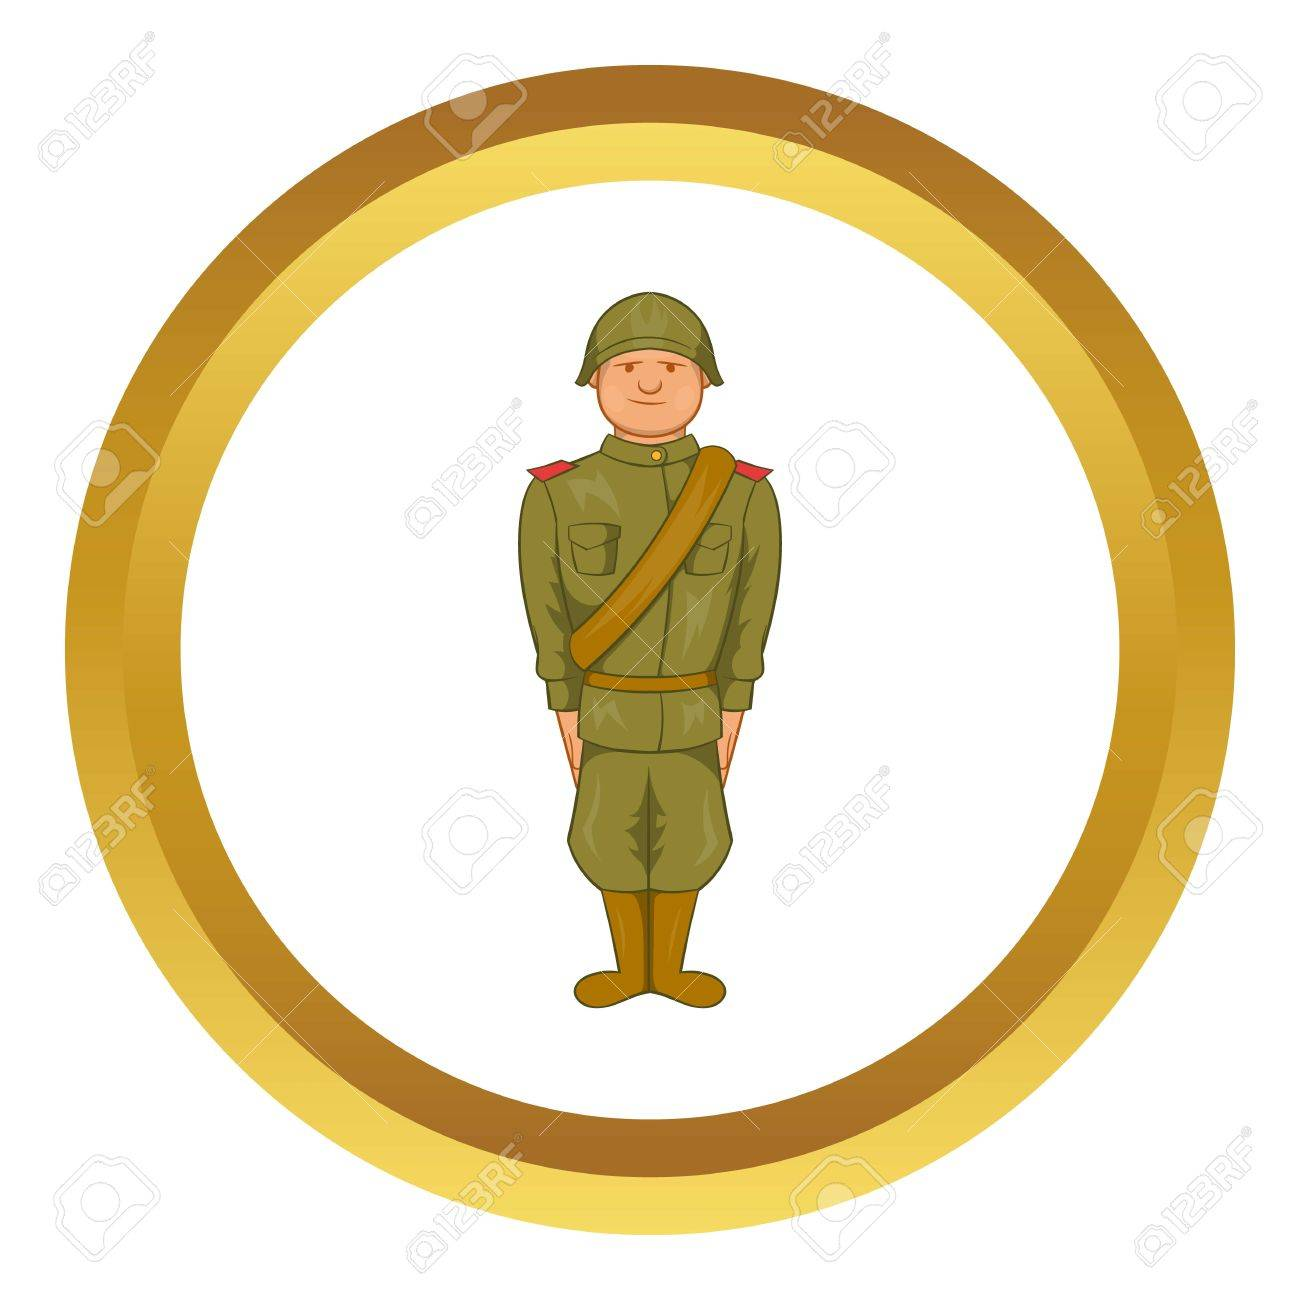 Soviet uniform of world war ii vector icon in golden circle soviet uniform of world war ii vector icon in golden circle cartoon style isolated on buycottarizona Gallery